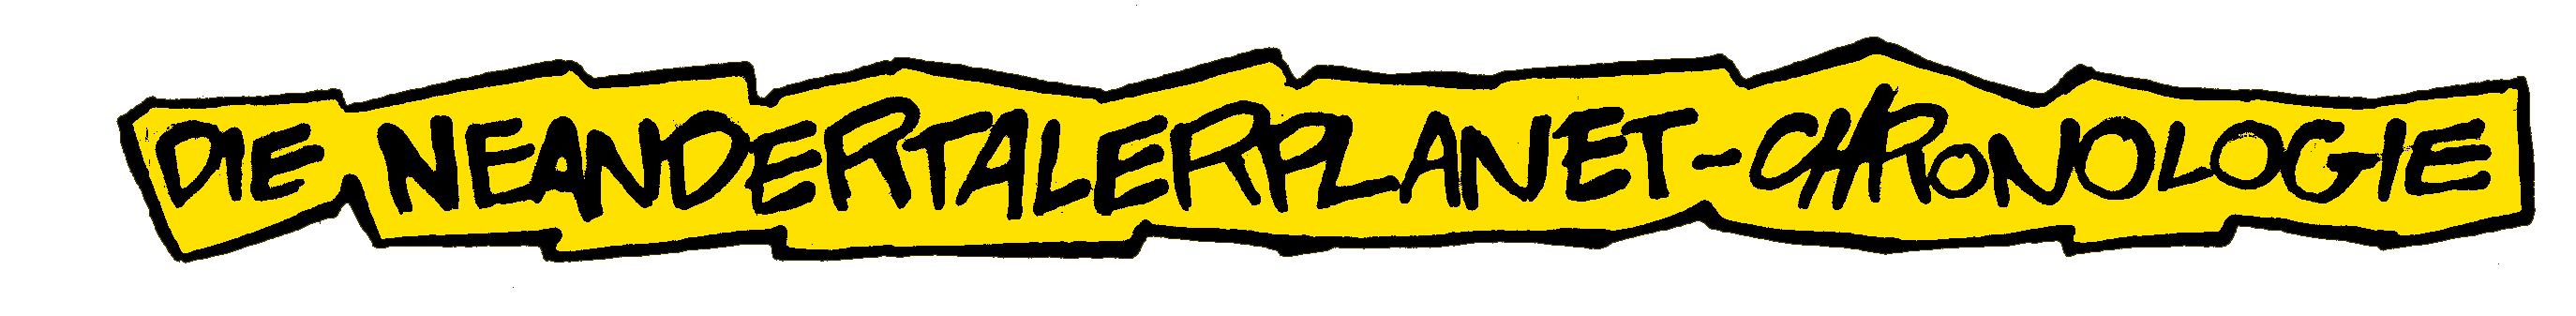 neandertalerplanet_logo